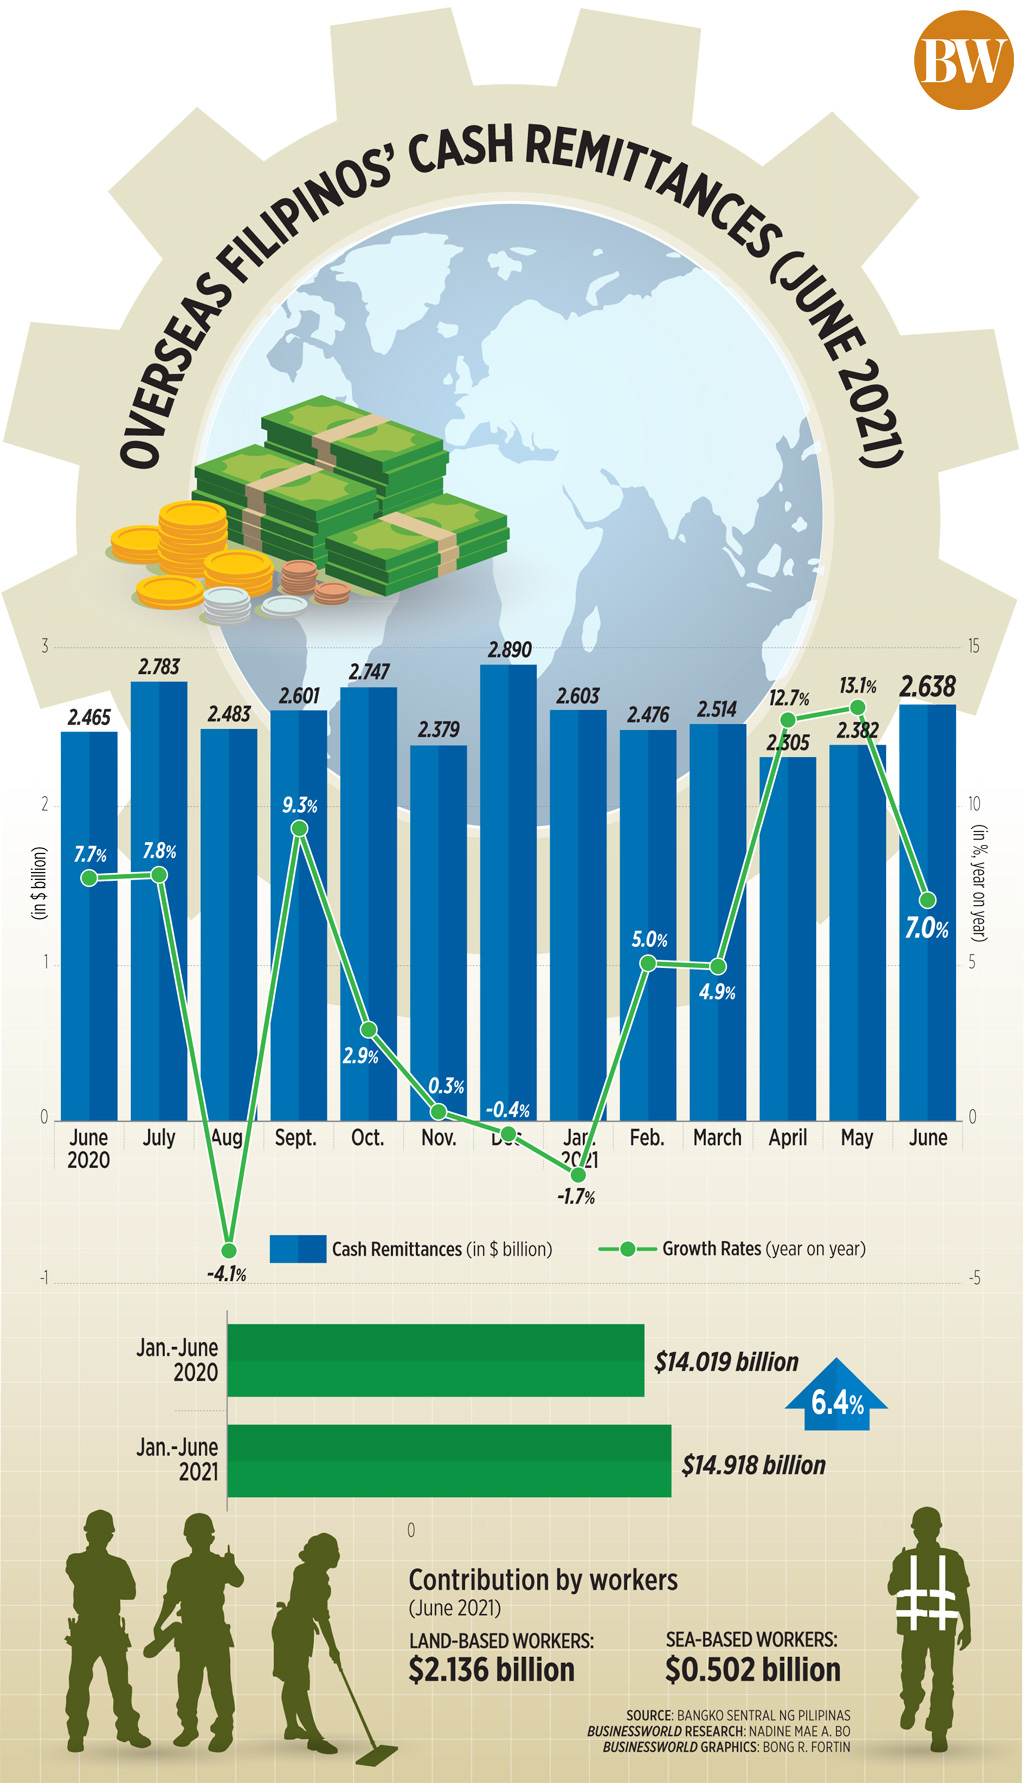 Overseas Filipinos' Cash Remittances (June 2021)